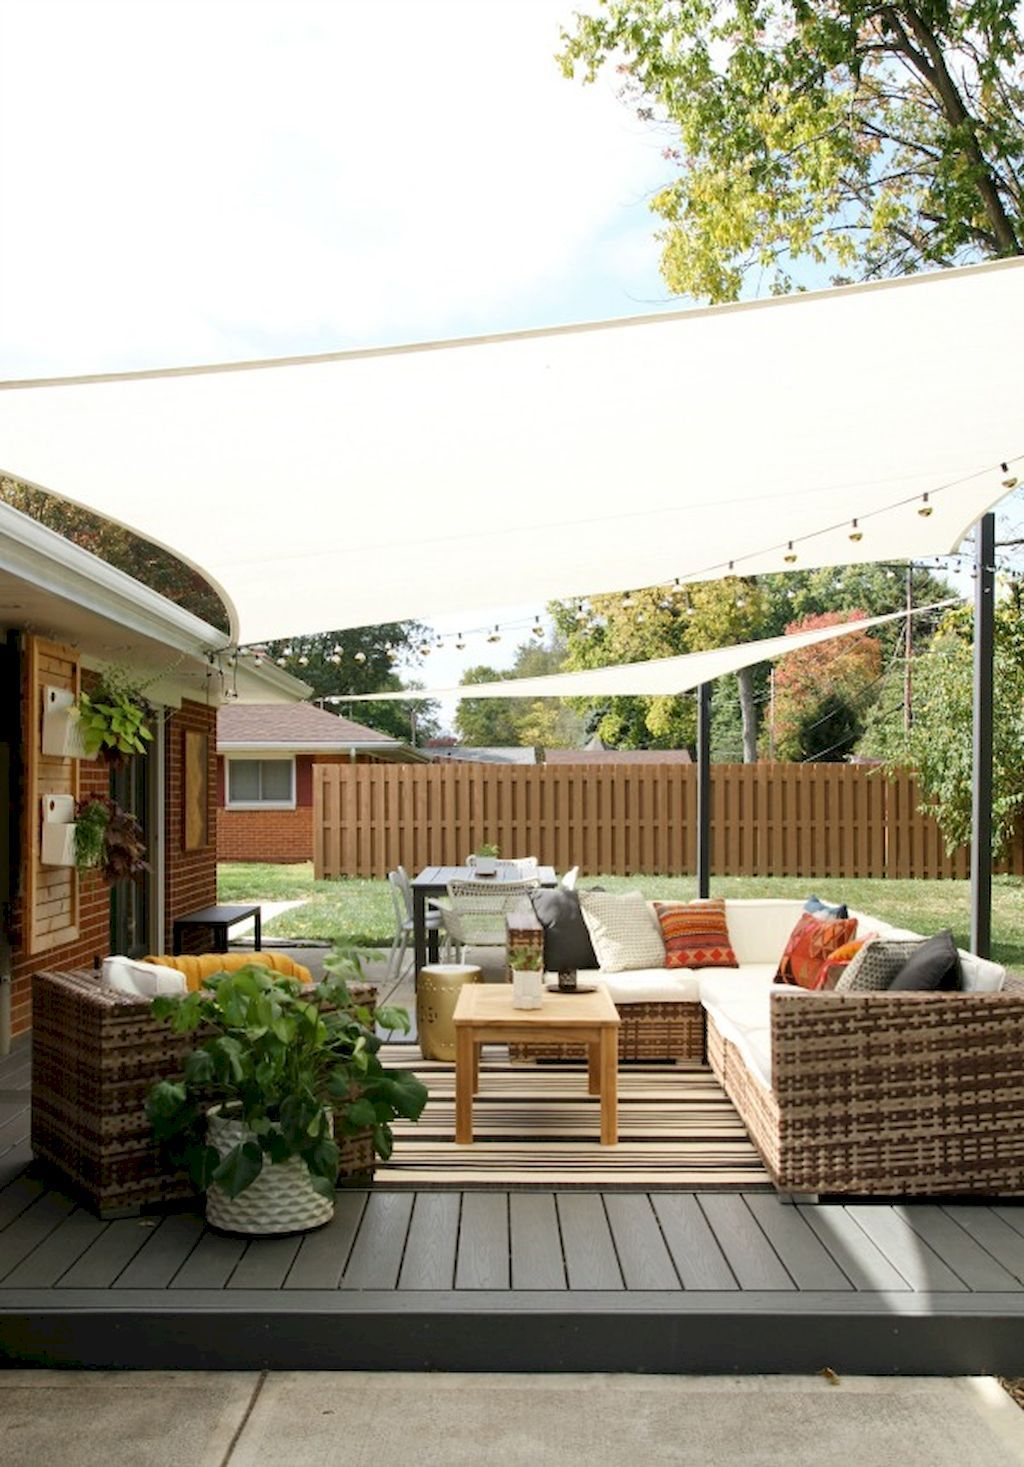 adorable 55 creative diy patio furniture  u0026 decoration ideas s     homespecially com  55